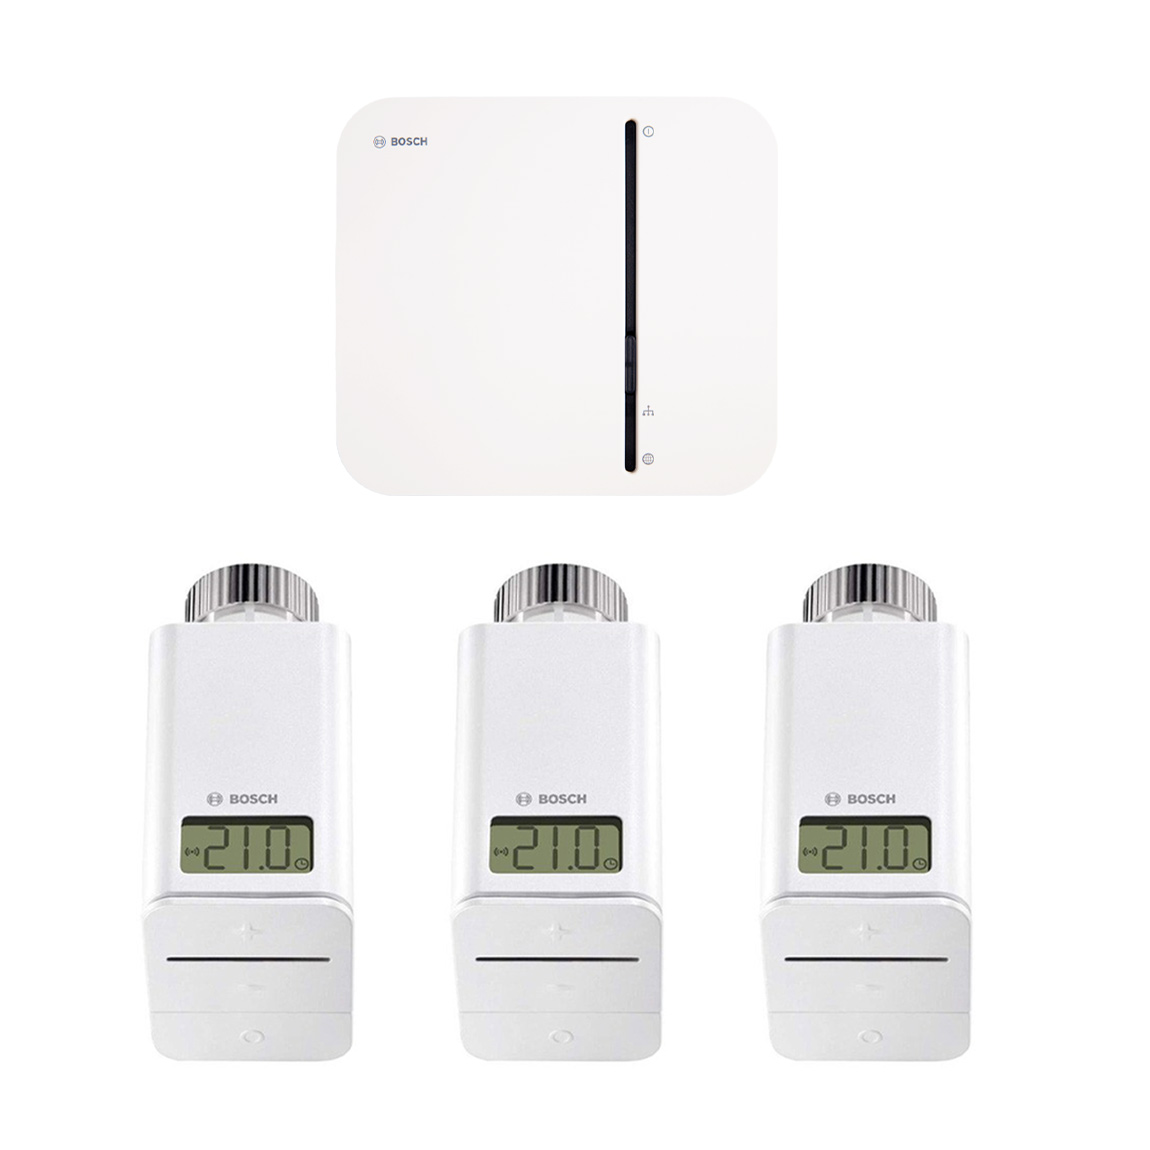 Bosch Smart Home - Starter Set Heizung + gratis Twinguard + Twist